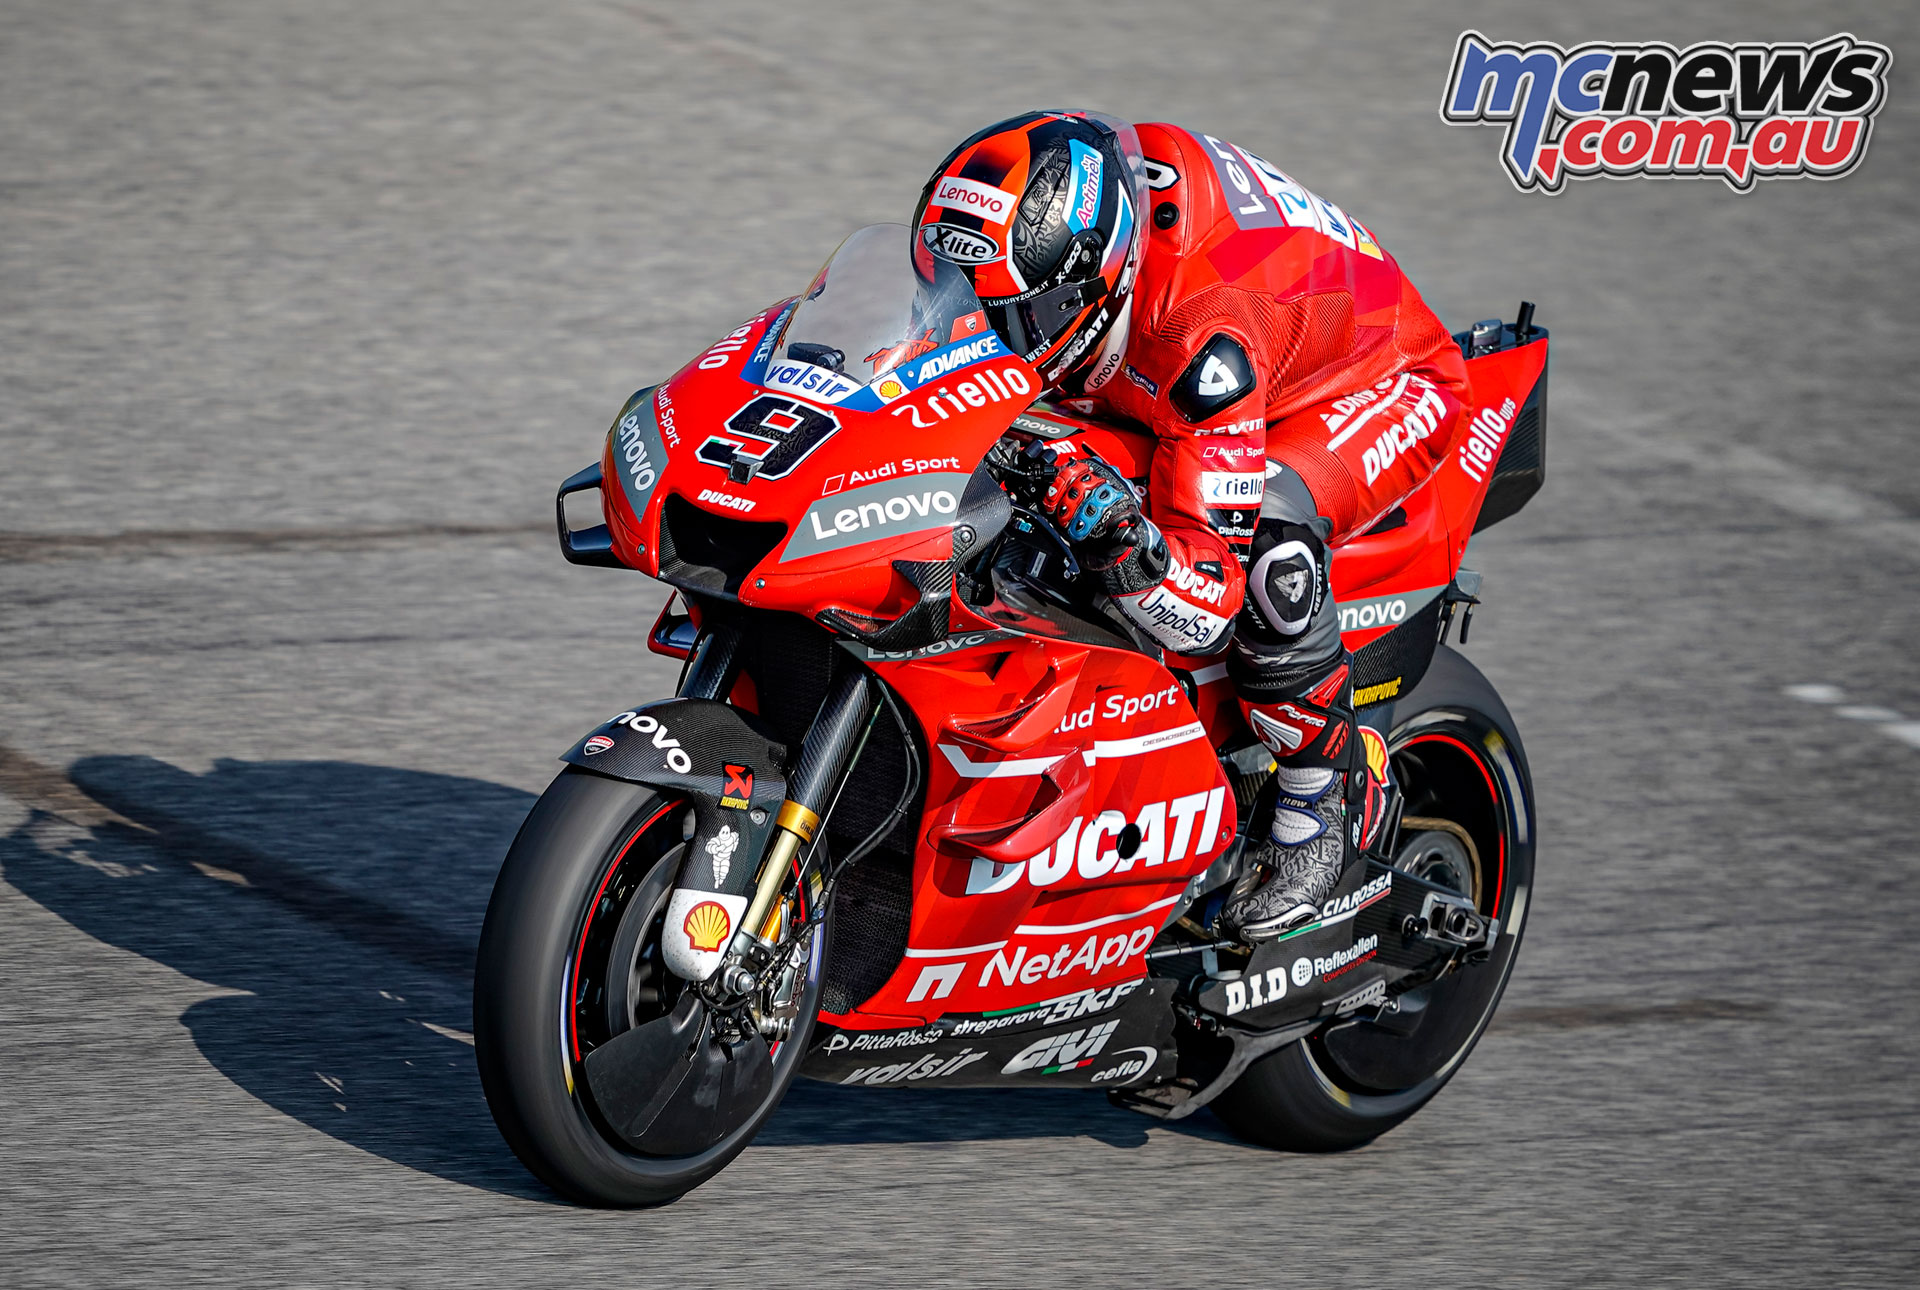 MotoGP Test Misano D Danilo Petrucci